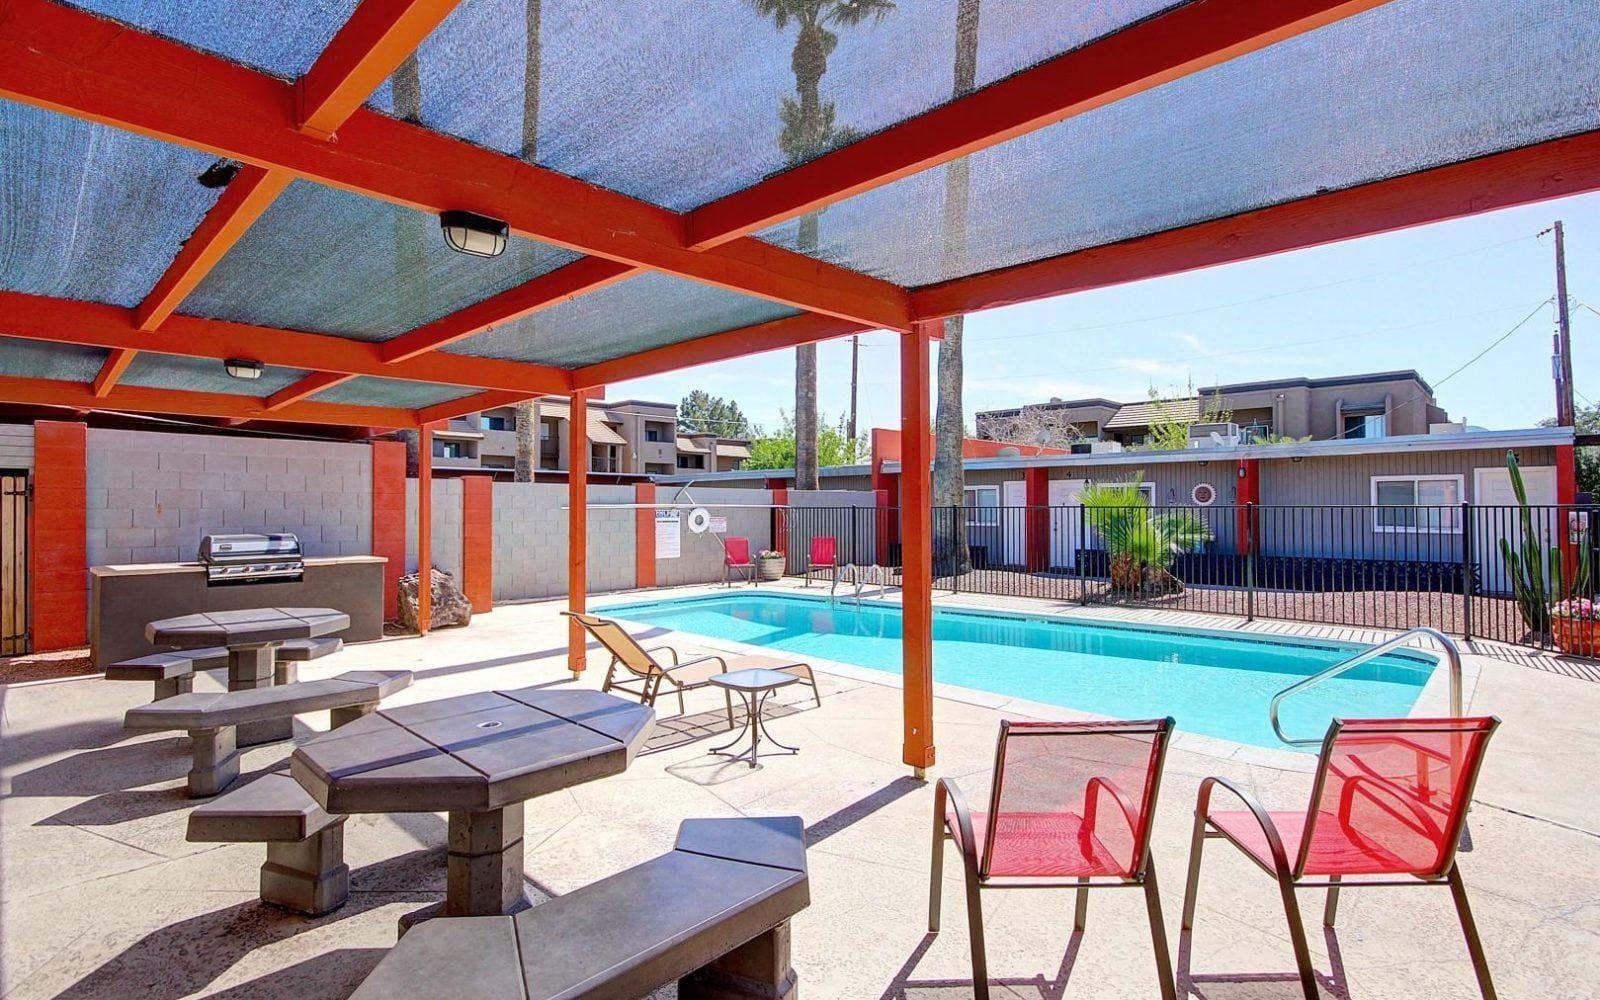 1717 W Missouri Ave #07, Phoenix, AZ - 1,050 USD/ month